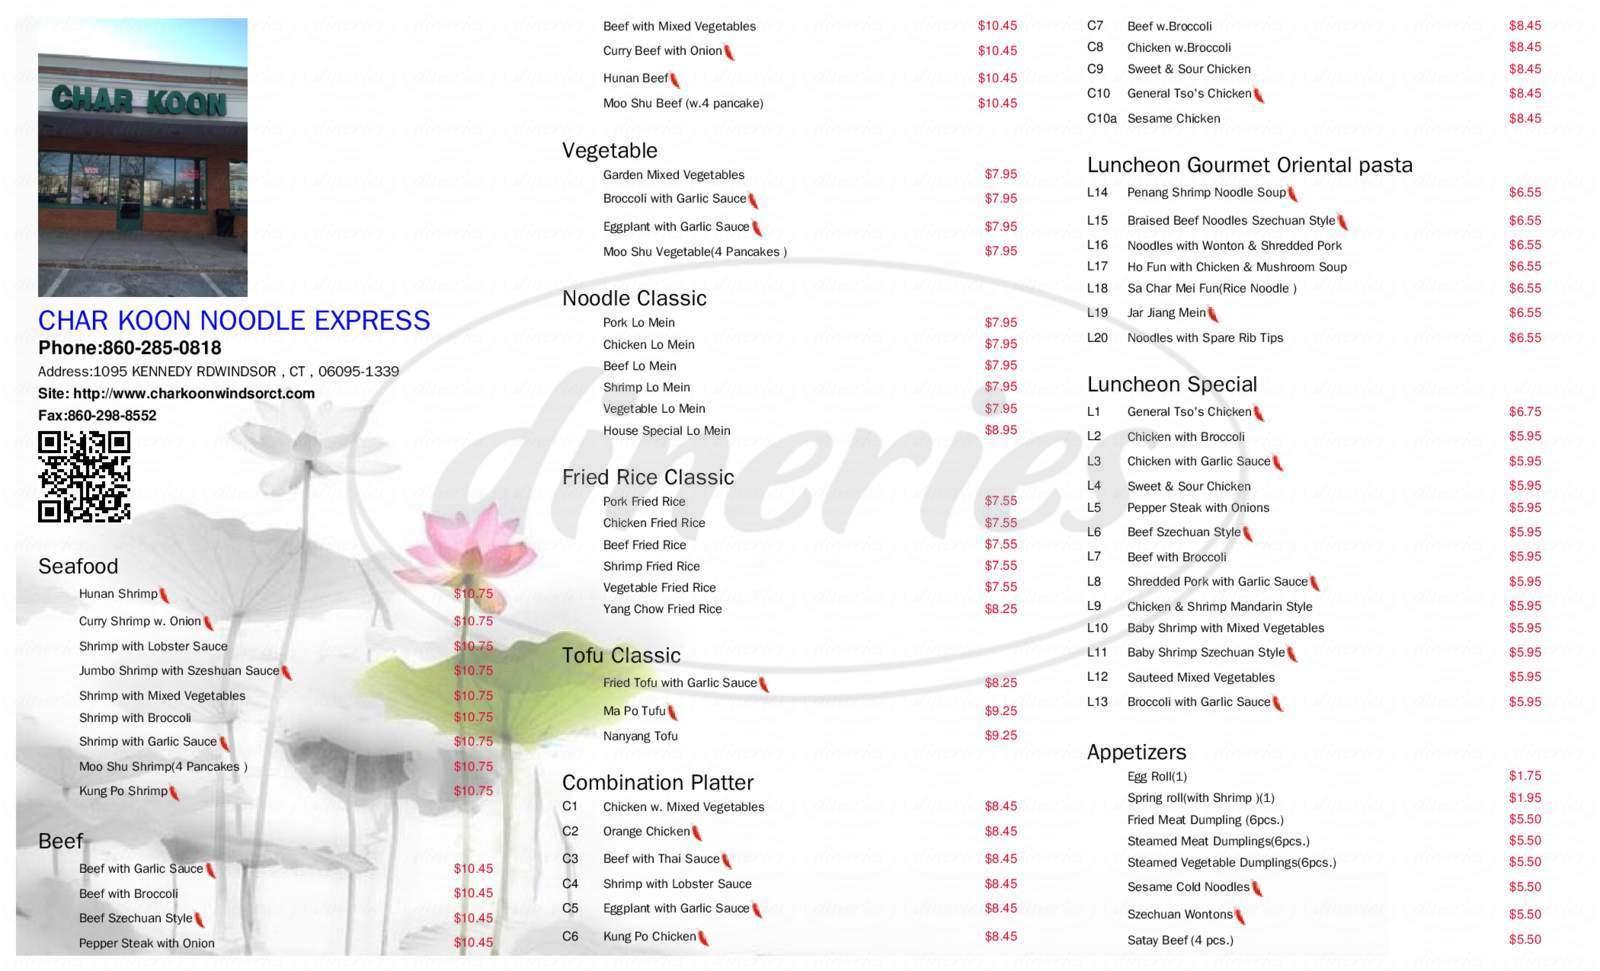 menu for Char Koon Noodle Express & Oriental Groceries